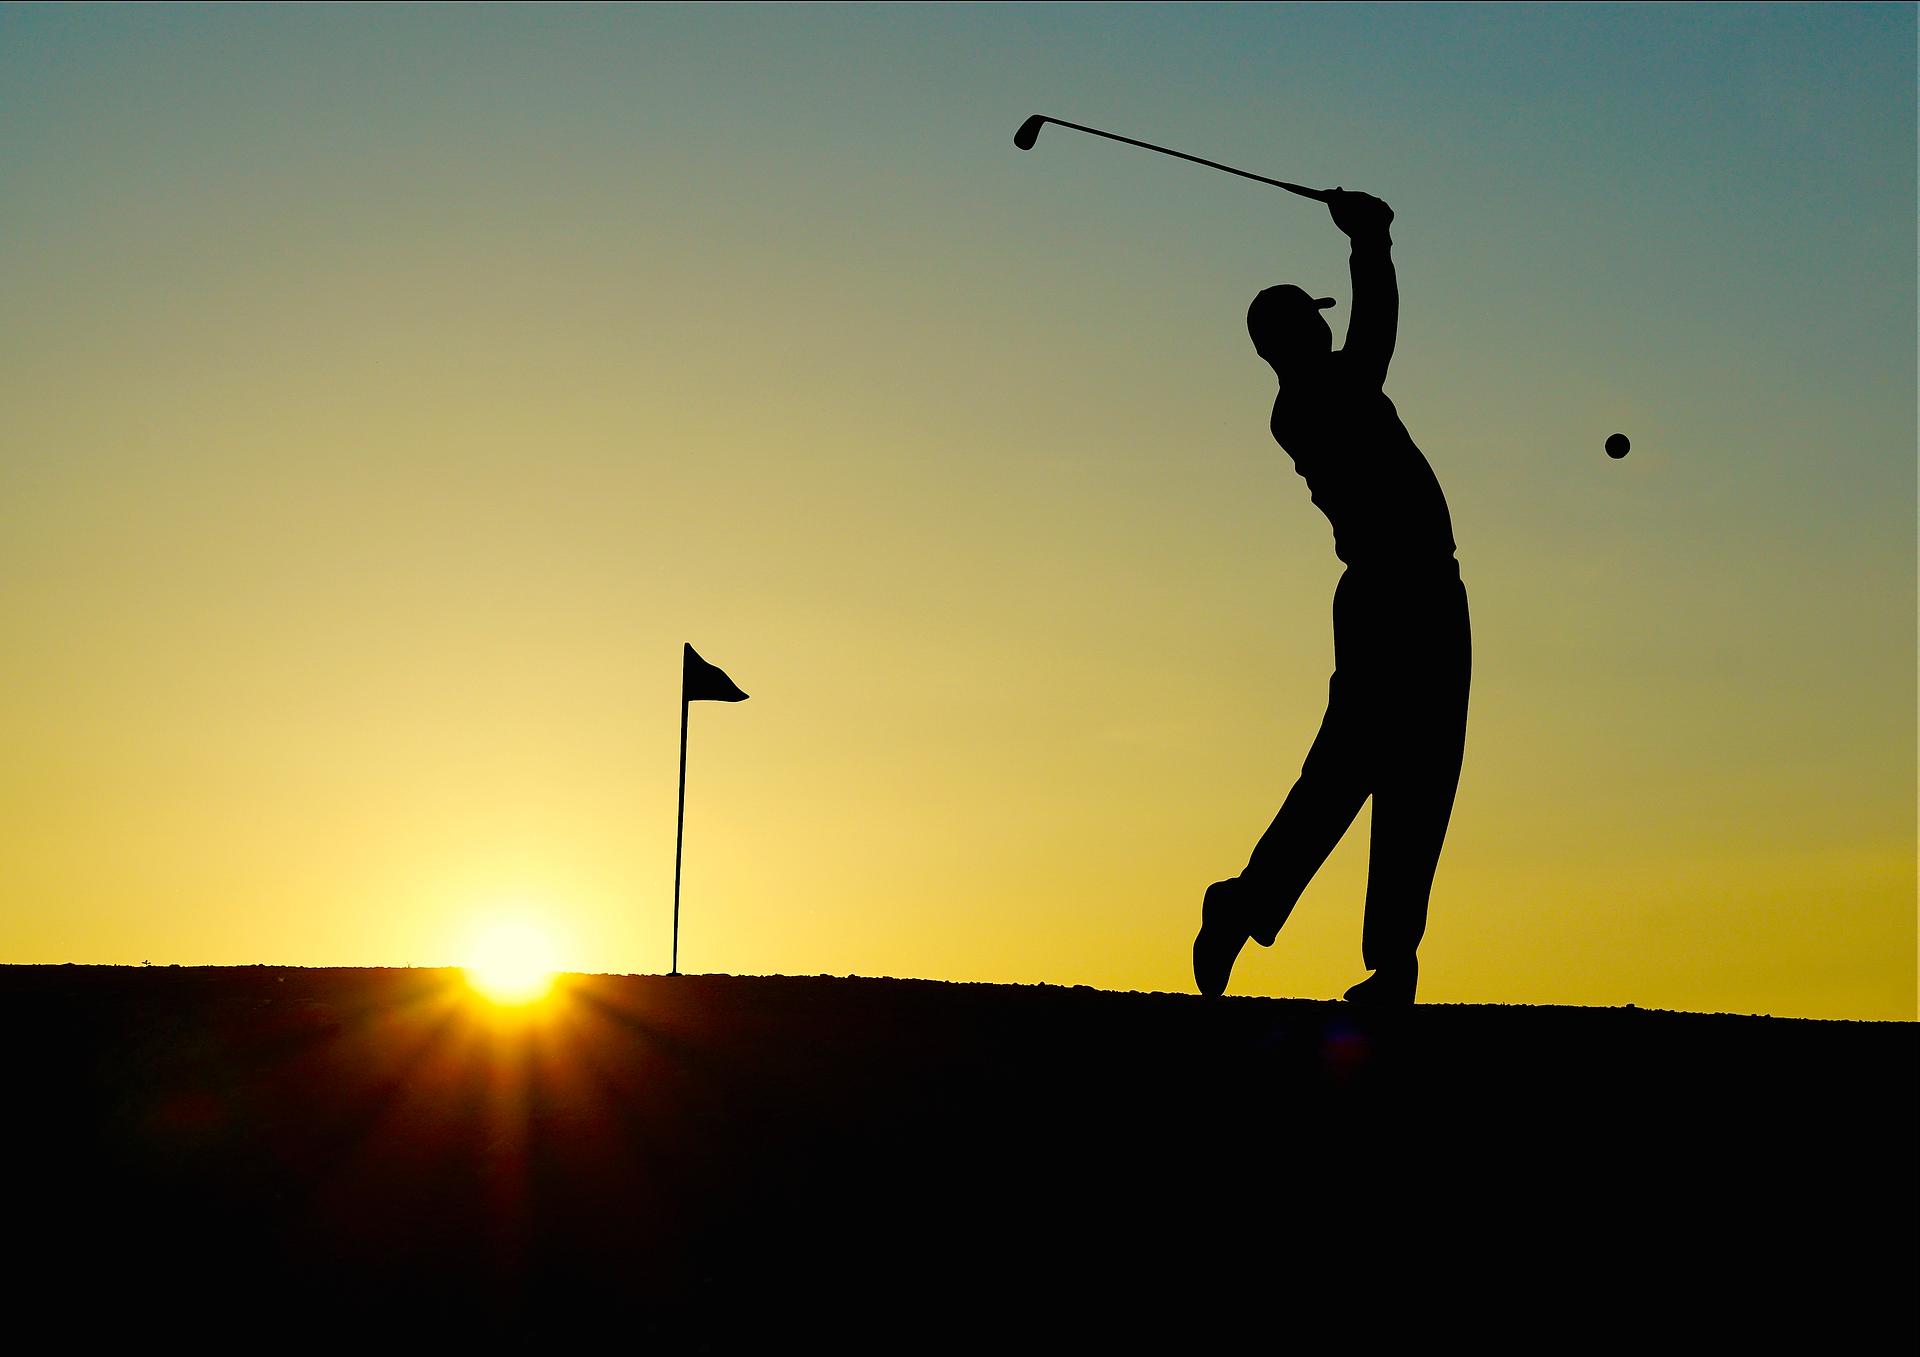 Dubai Investor Bin Zayed Will Build an International Standard Golf Course on Merese Hill